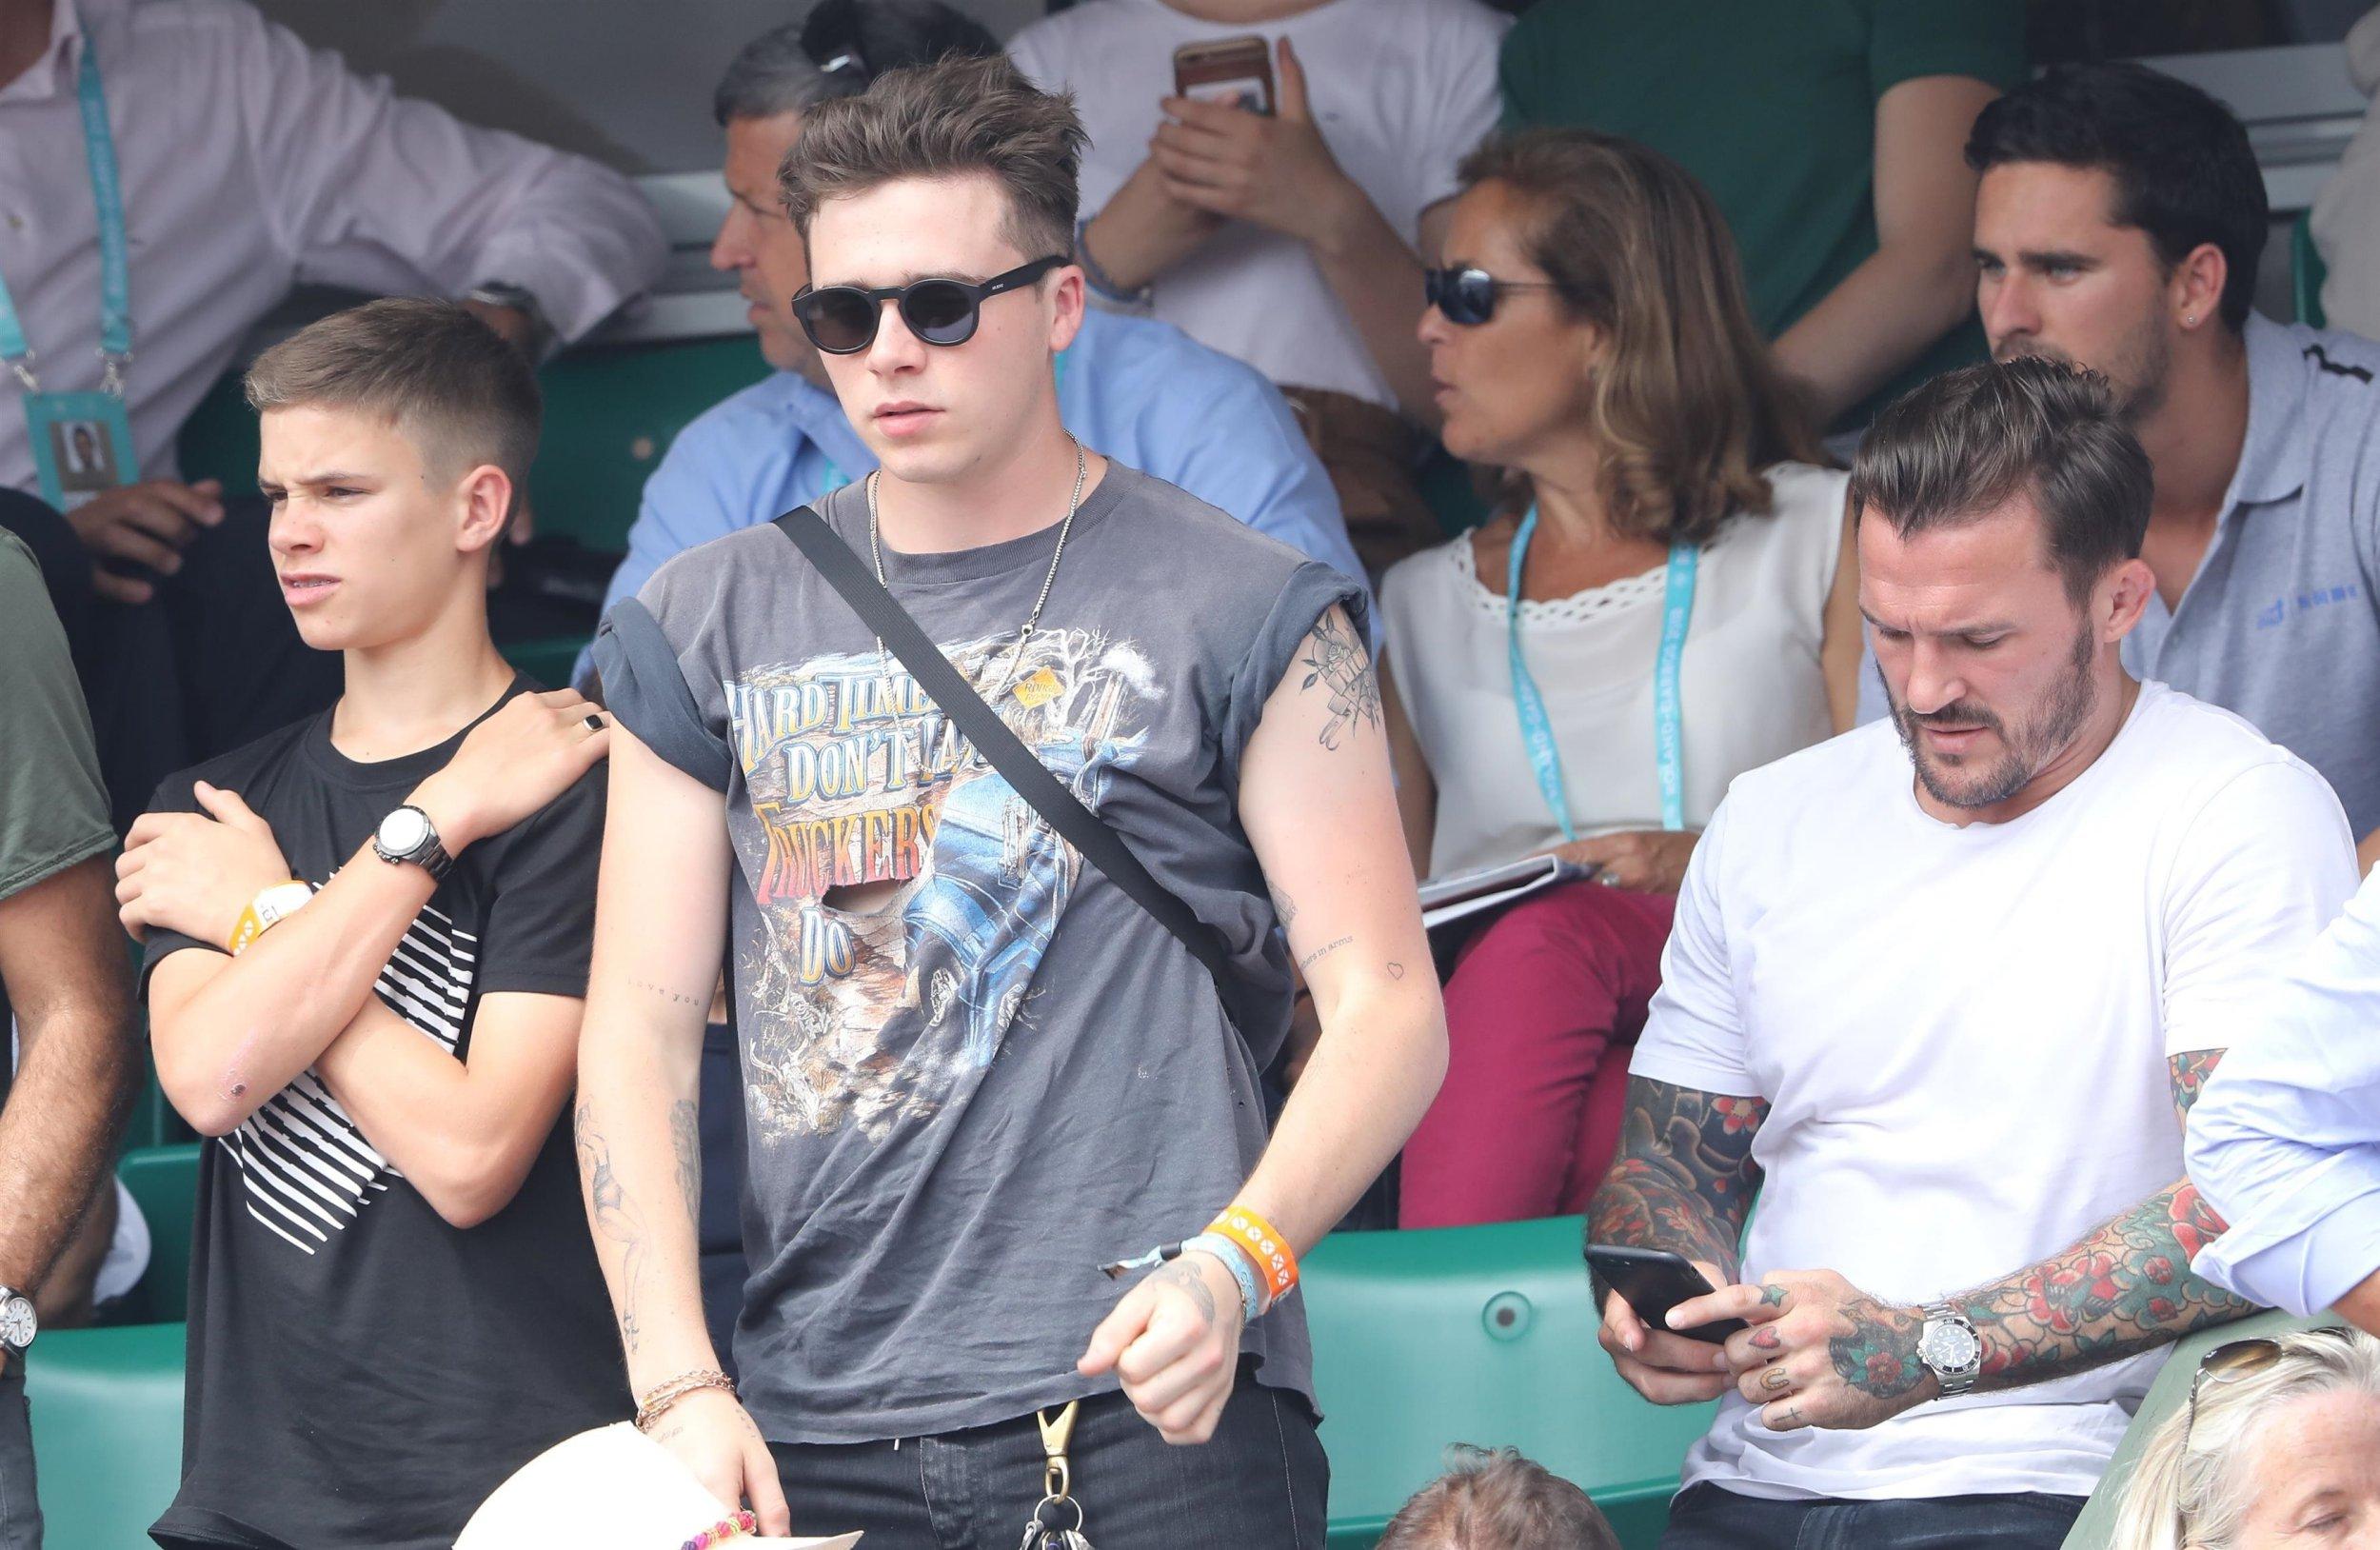 BGUK_1258768 - ** RIGHTS: ONLY UNITED KINGDOM ** Paris, FRANCE - Romeo and Brooklyn Beckham attend the french open at Roland Garros in Paris Pictured: Romeo Beckham - Brooklyn Beckham BACKGRID UK 10 JUNE 2018 BYLINE MUST READ: BEST IMAGE / BACKGRID UK: +44 208 344 2007 / uksales@backgrid.com USA: +1 310 798 9111 / usasales@backgrid.com *UK Clients - Pictures Containing Children Please Pixelate Face Prior To Publication*